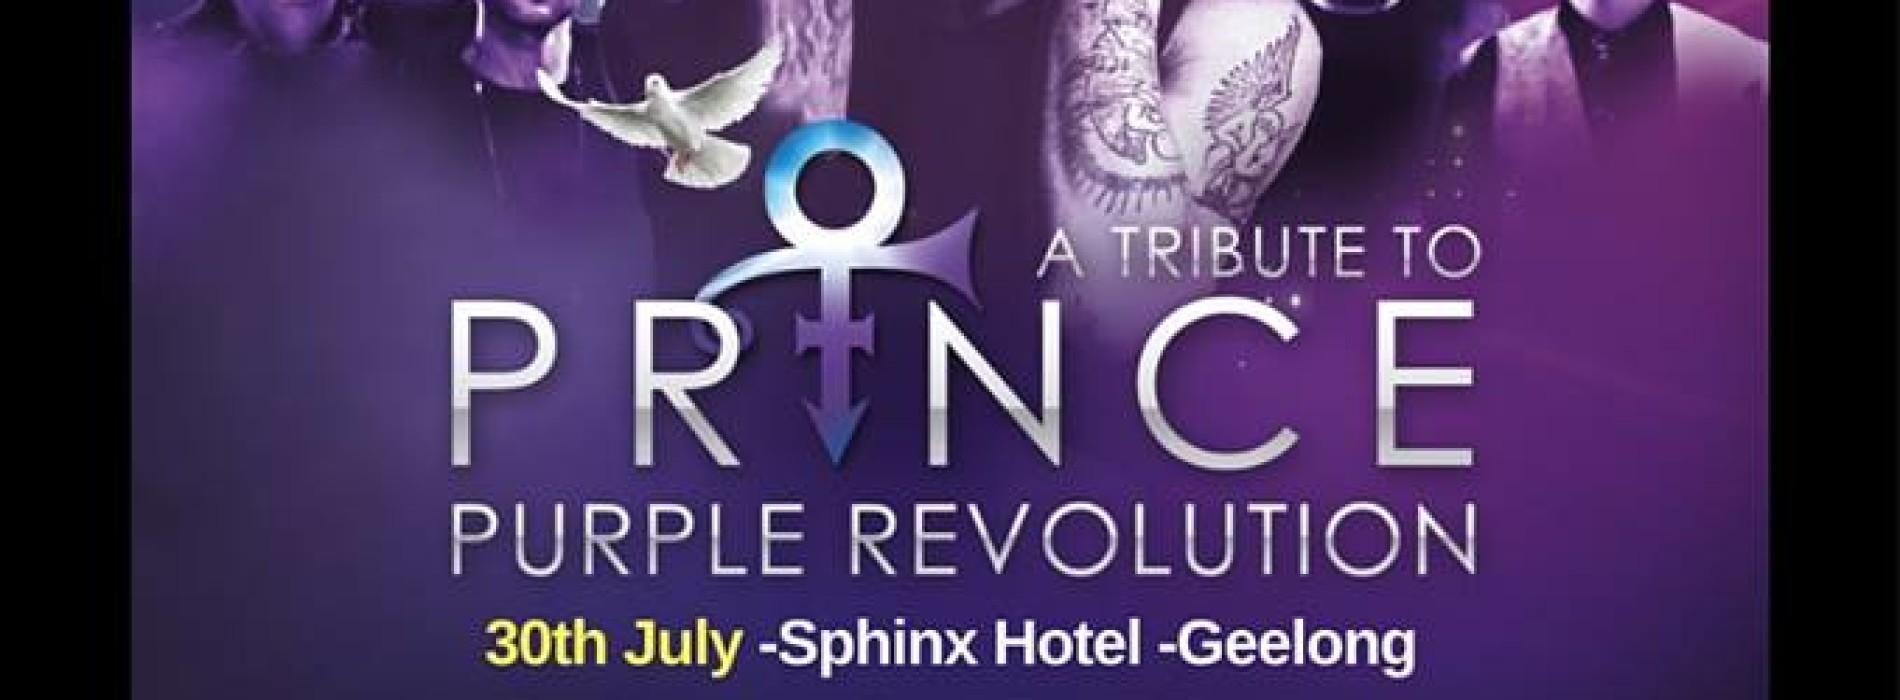 Purple Revolution Plays This Saturday